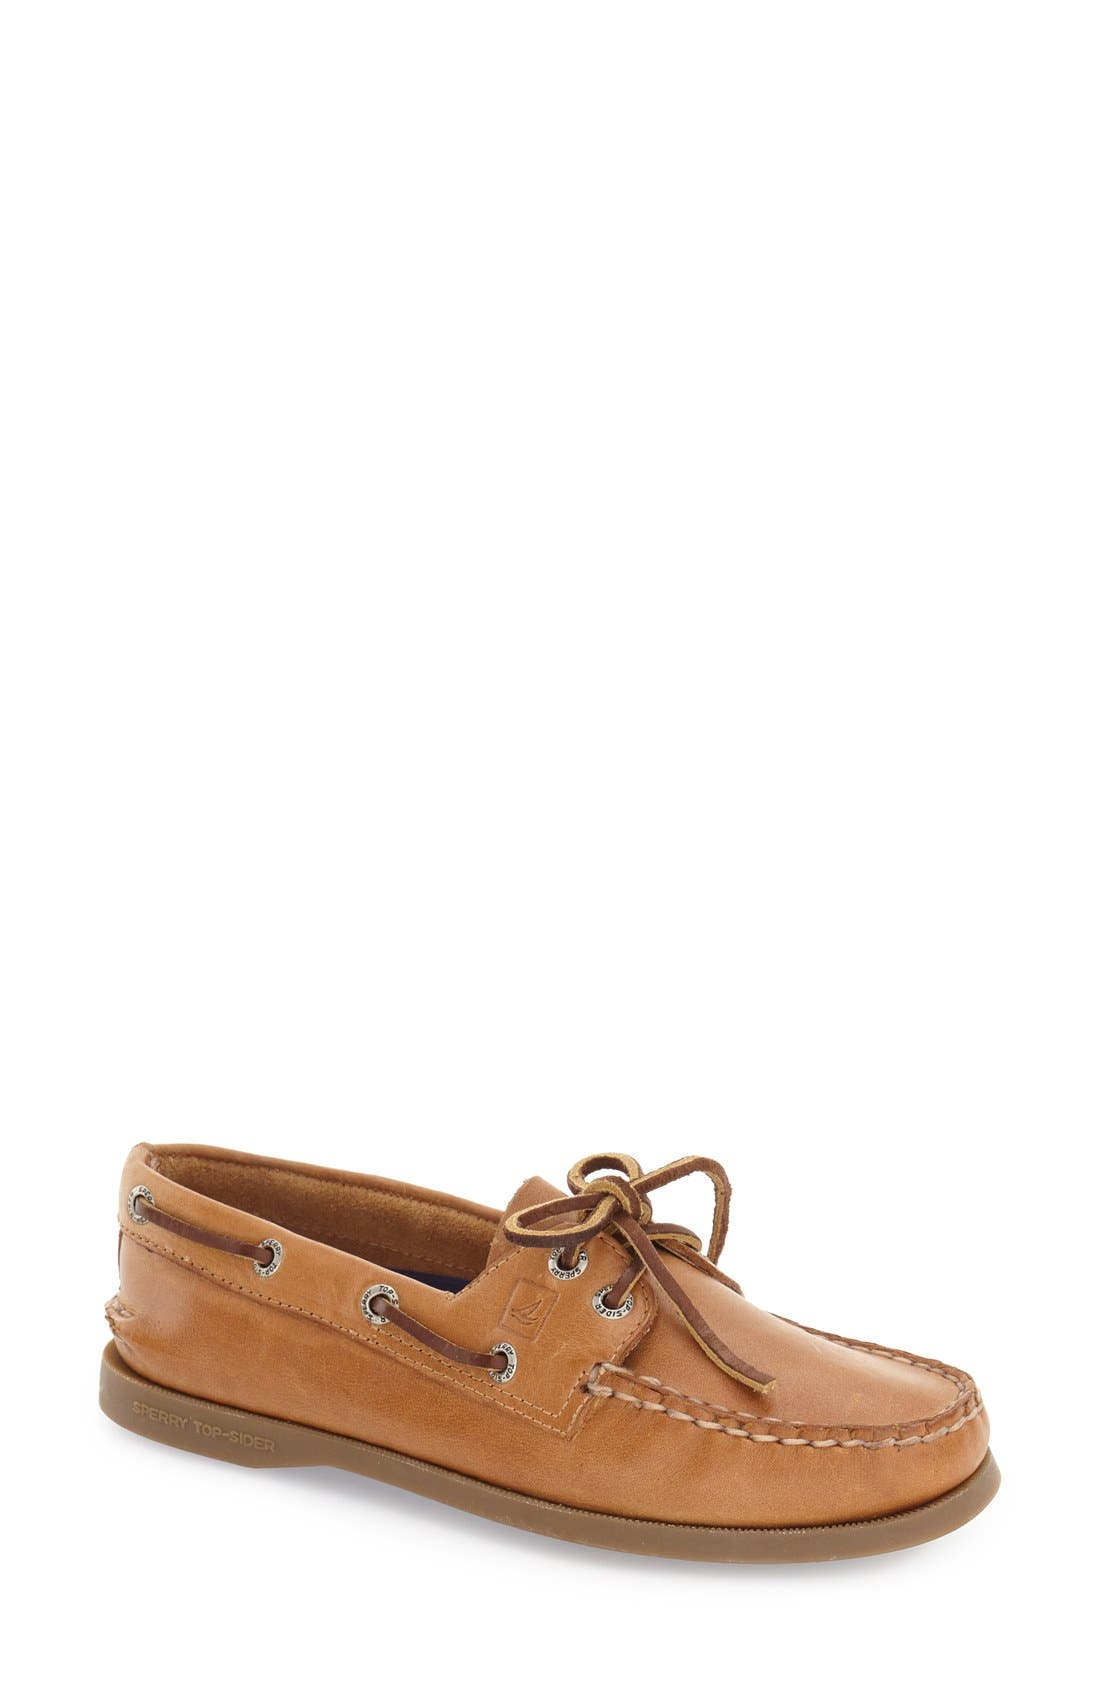 Sperry 'Authentic Original' Boat Shoe (Women)